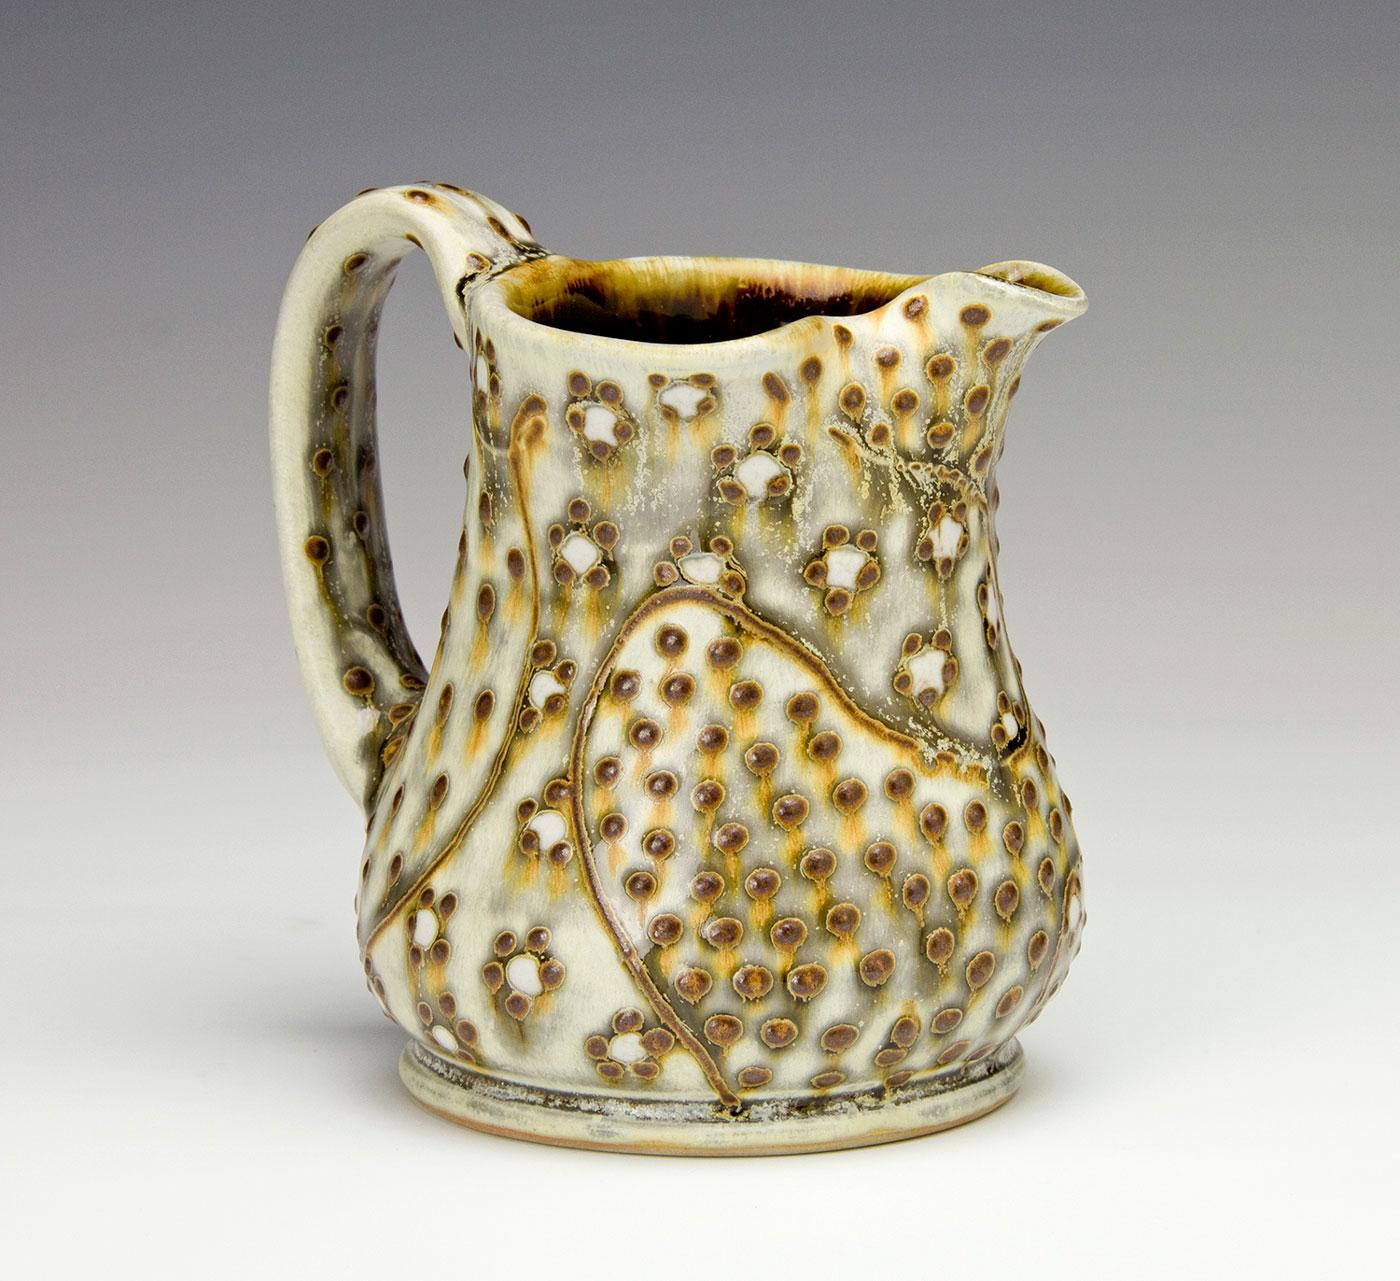 Creamer-Pattern-Medley-Samantha-Henneke-Bulldog-Pottery-Seagrove-North-Carolina.jpg